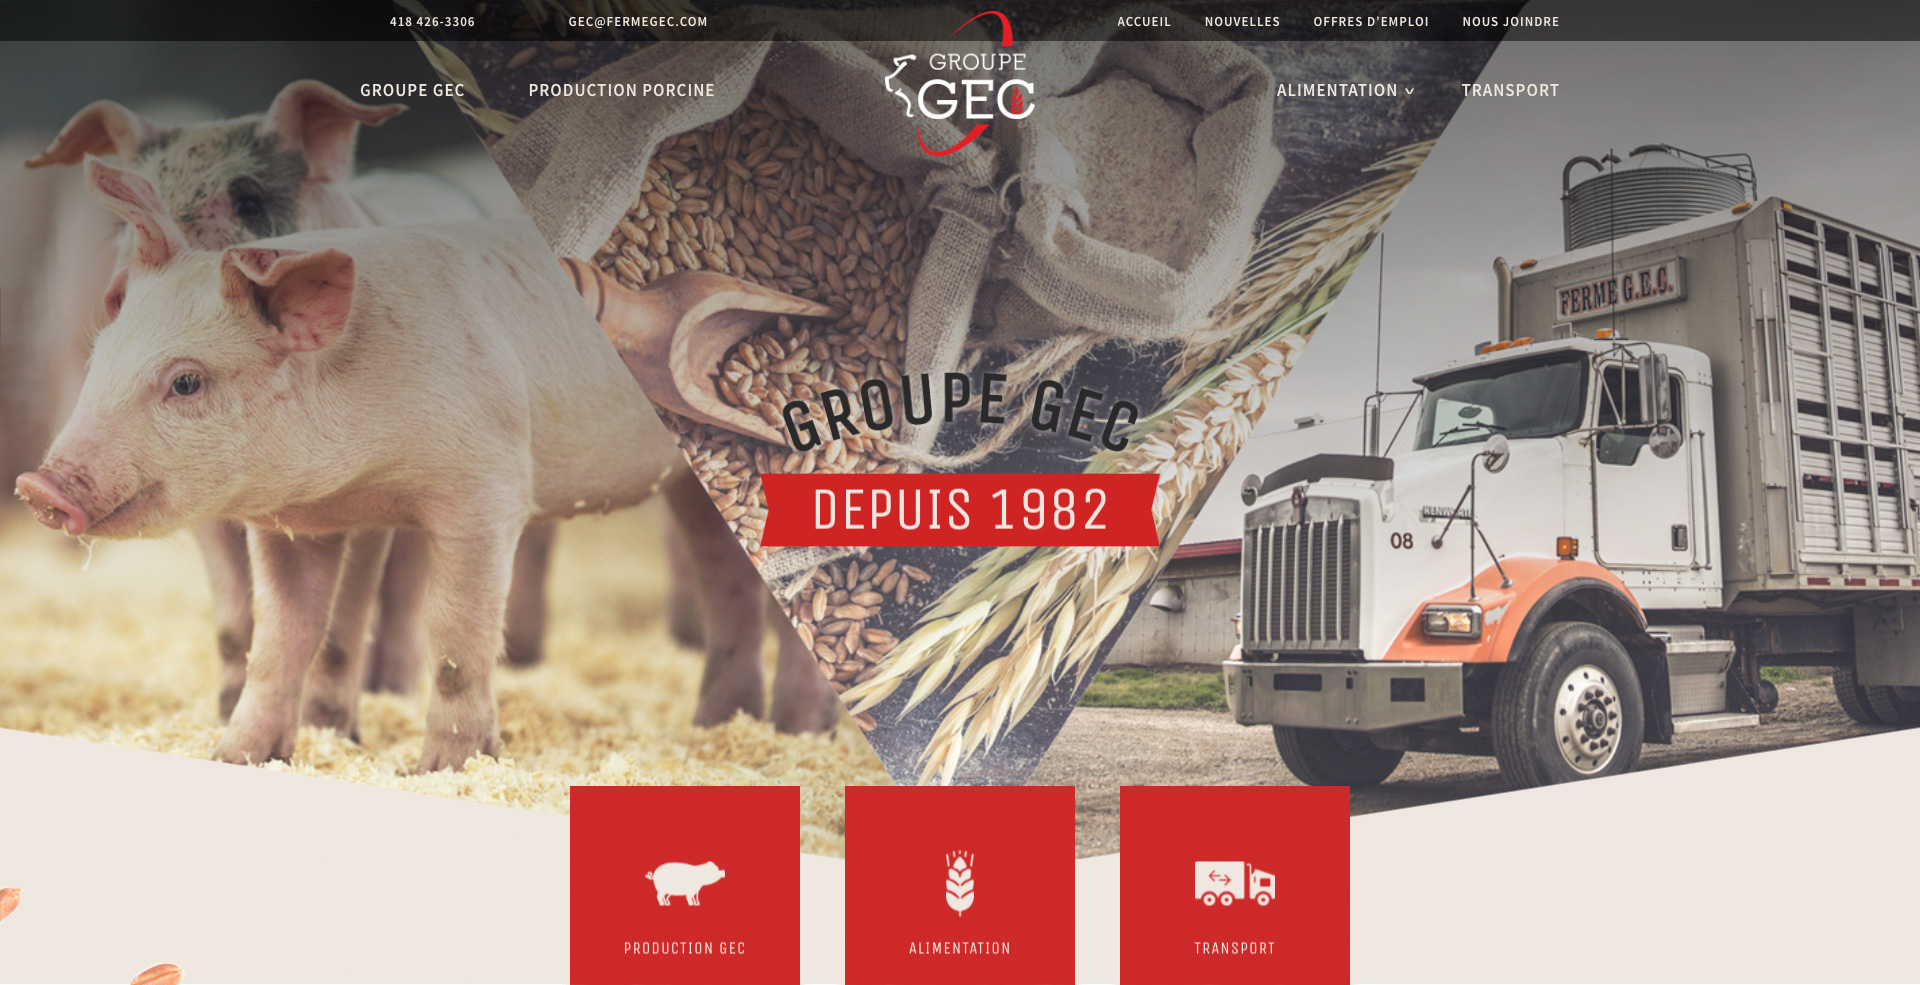 Groupe GEC